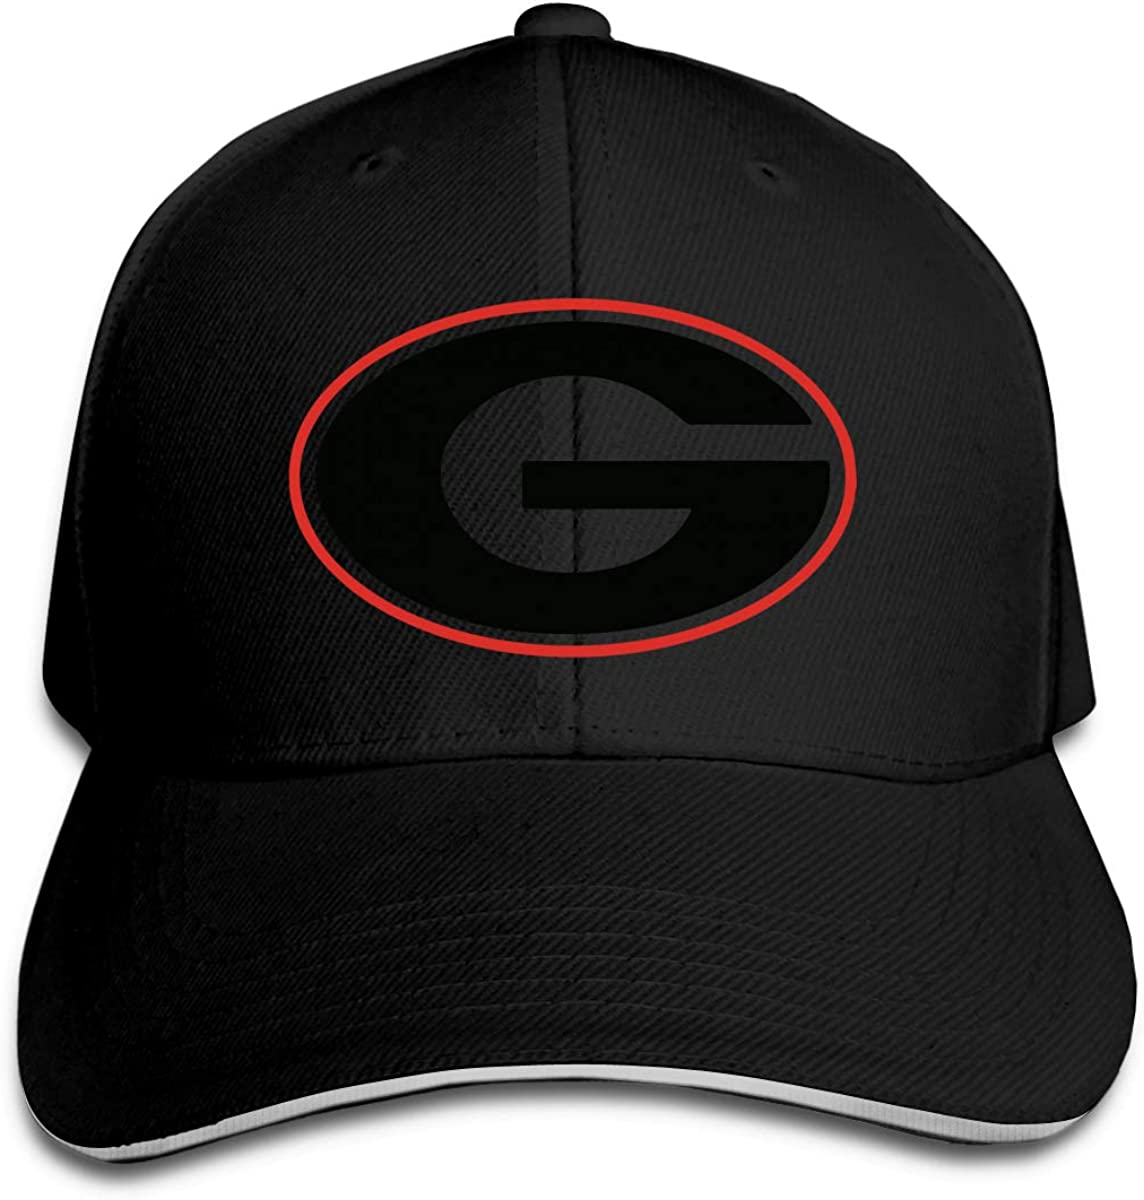 Georgia Bulldog Fit Women Men Professional Baseball Hat Baseball Cap